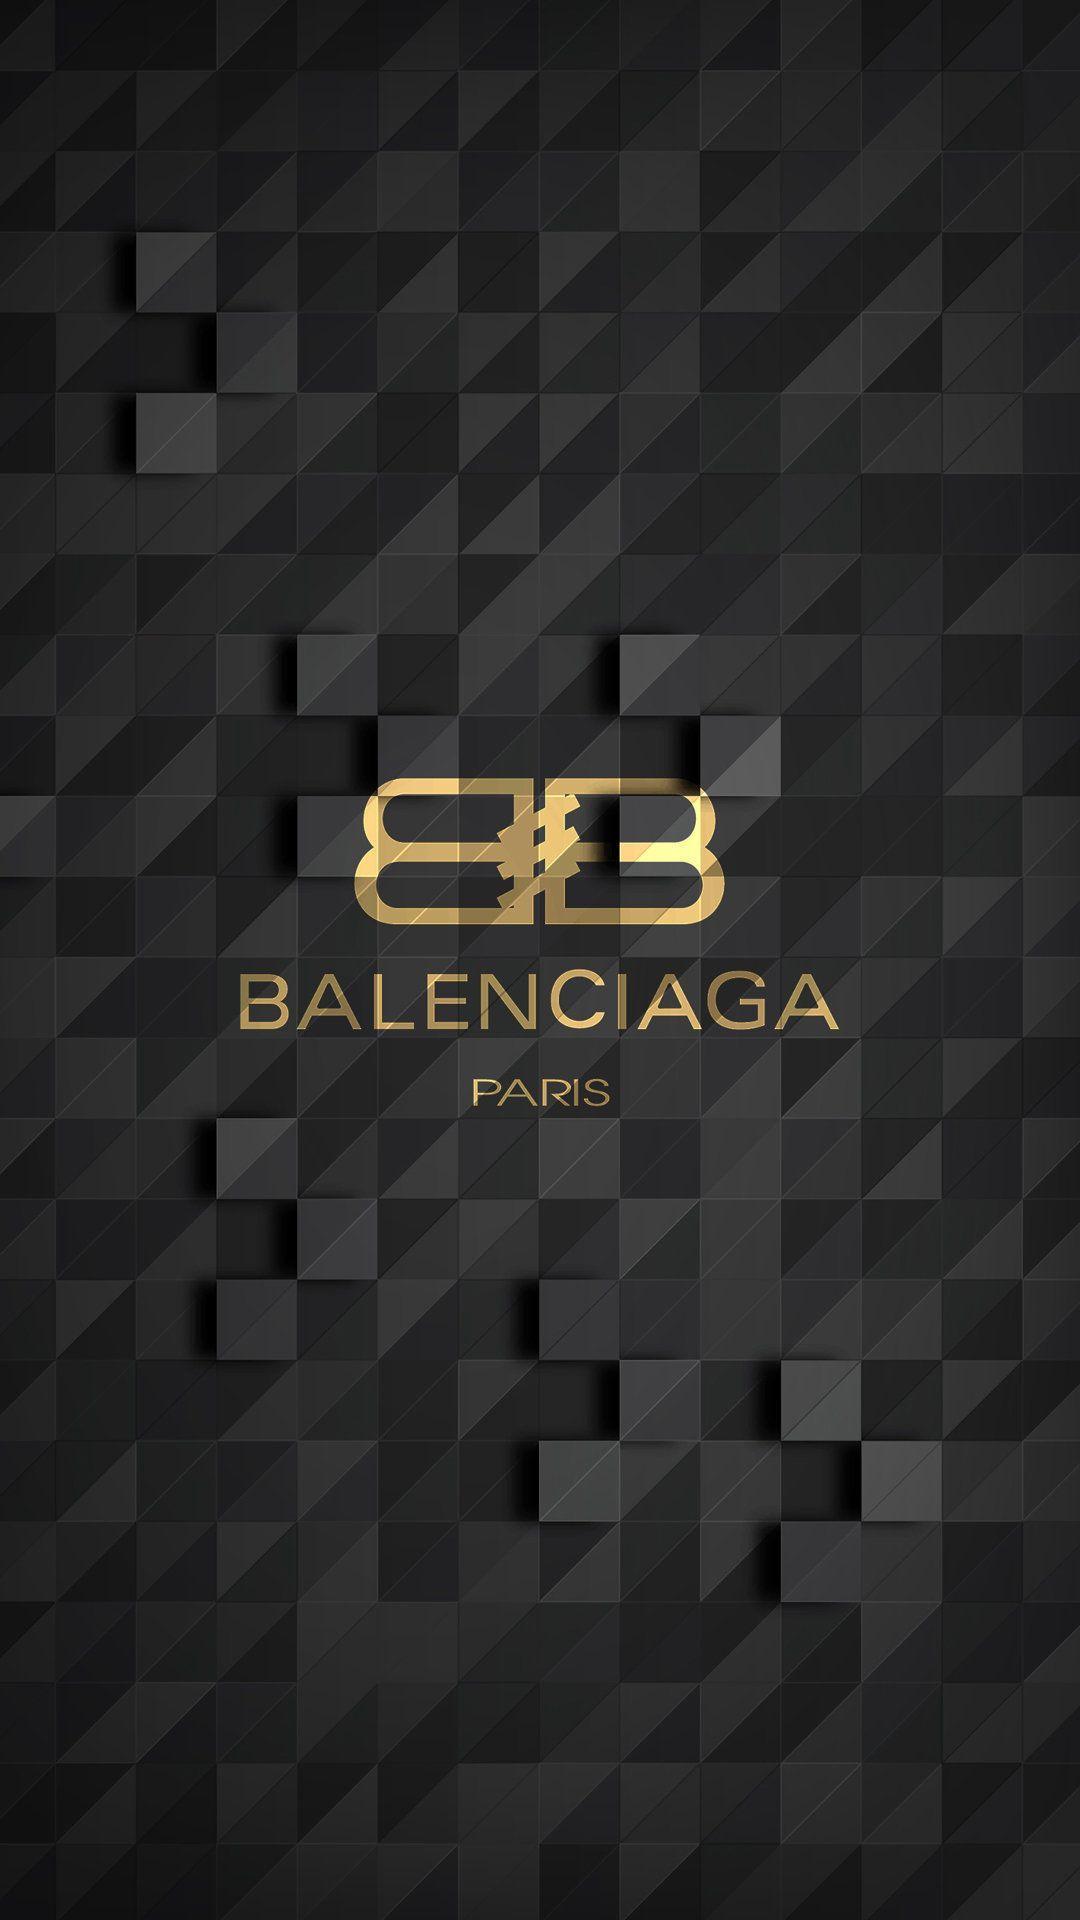 balenciaga wallpapers iphone mobile gucci version wallpapercave